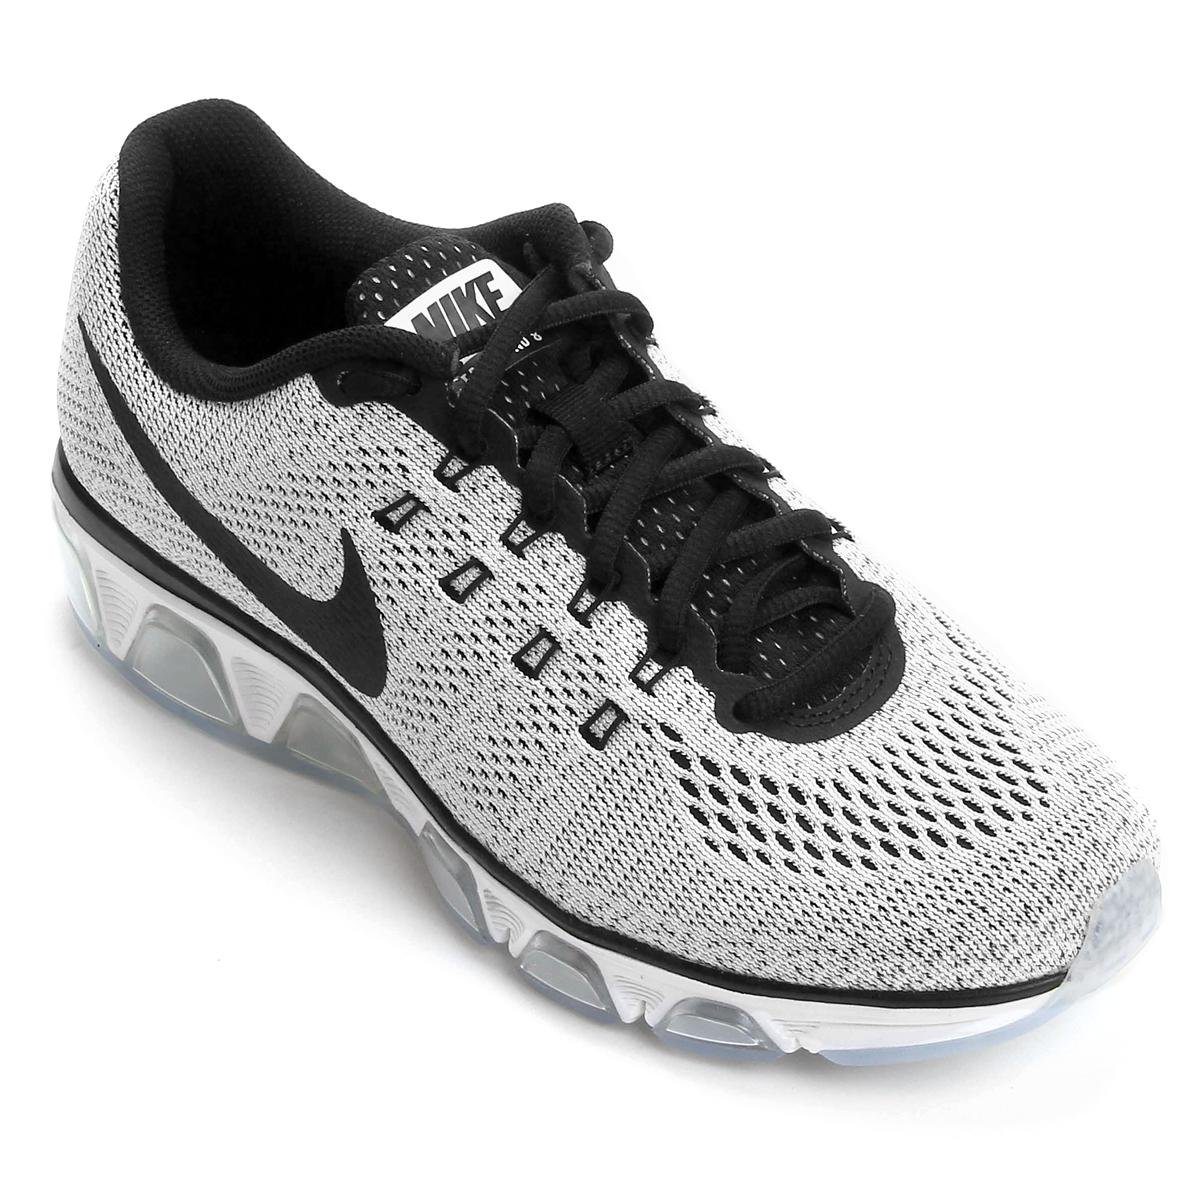 buy popular 51bf8 913b1 Tênis Nike Air Max Tailwind 8 Masculino - Branco e Preto